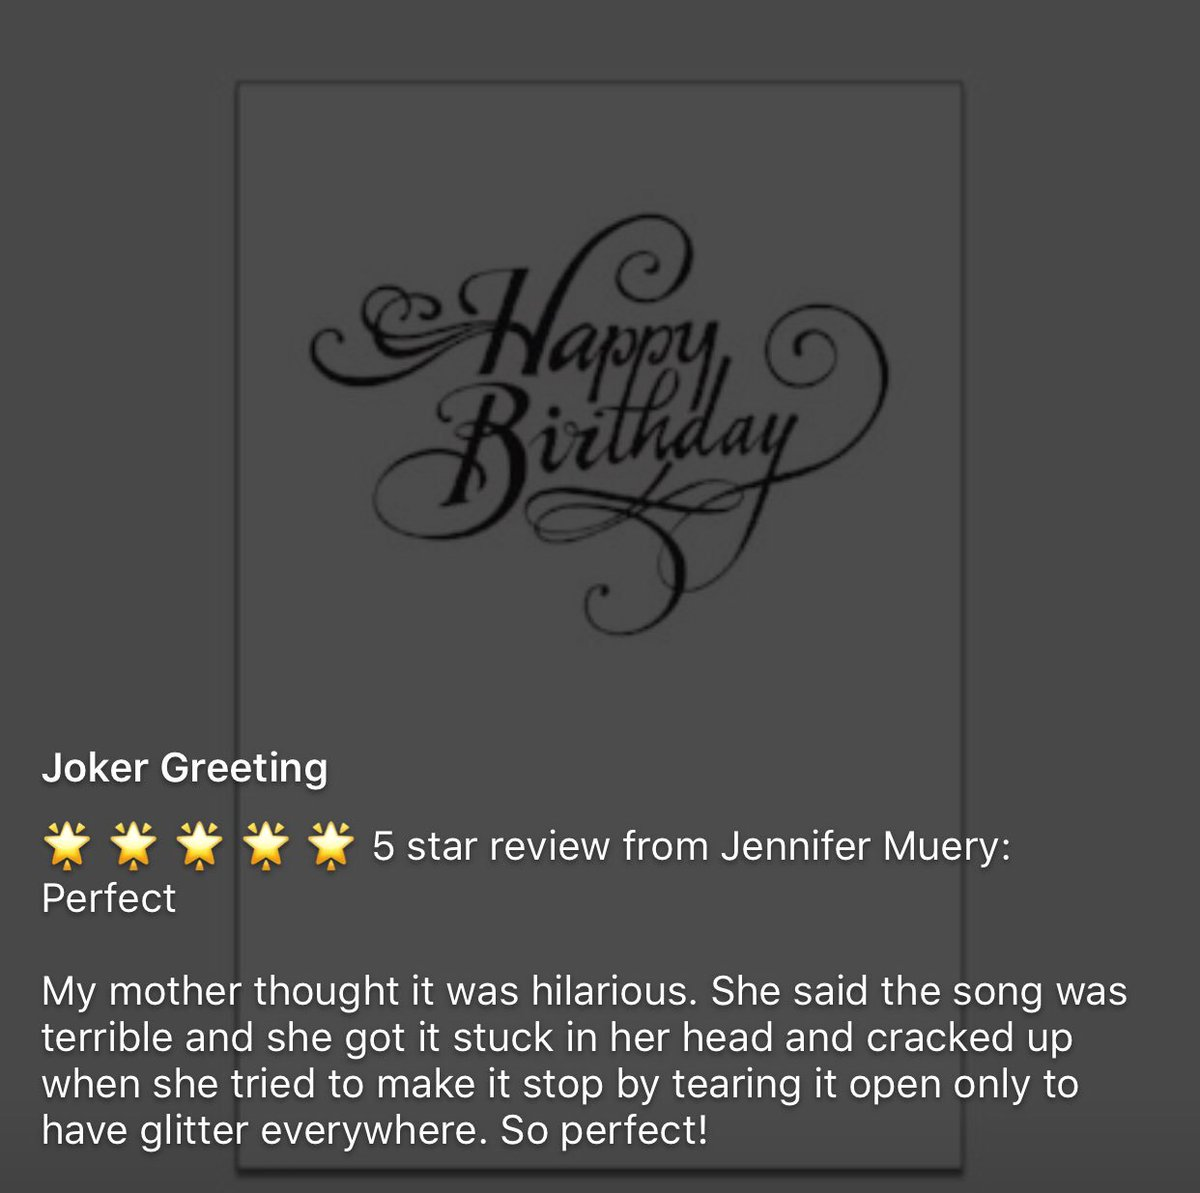 Joker greeting on twitter so perfect prank greeting cards joker greeting on twitter so perfect prank greeting cards birthday gift funny m4hsunfo